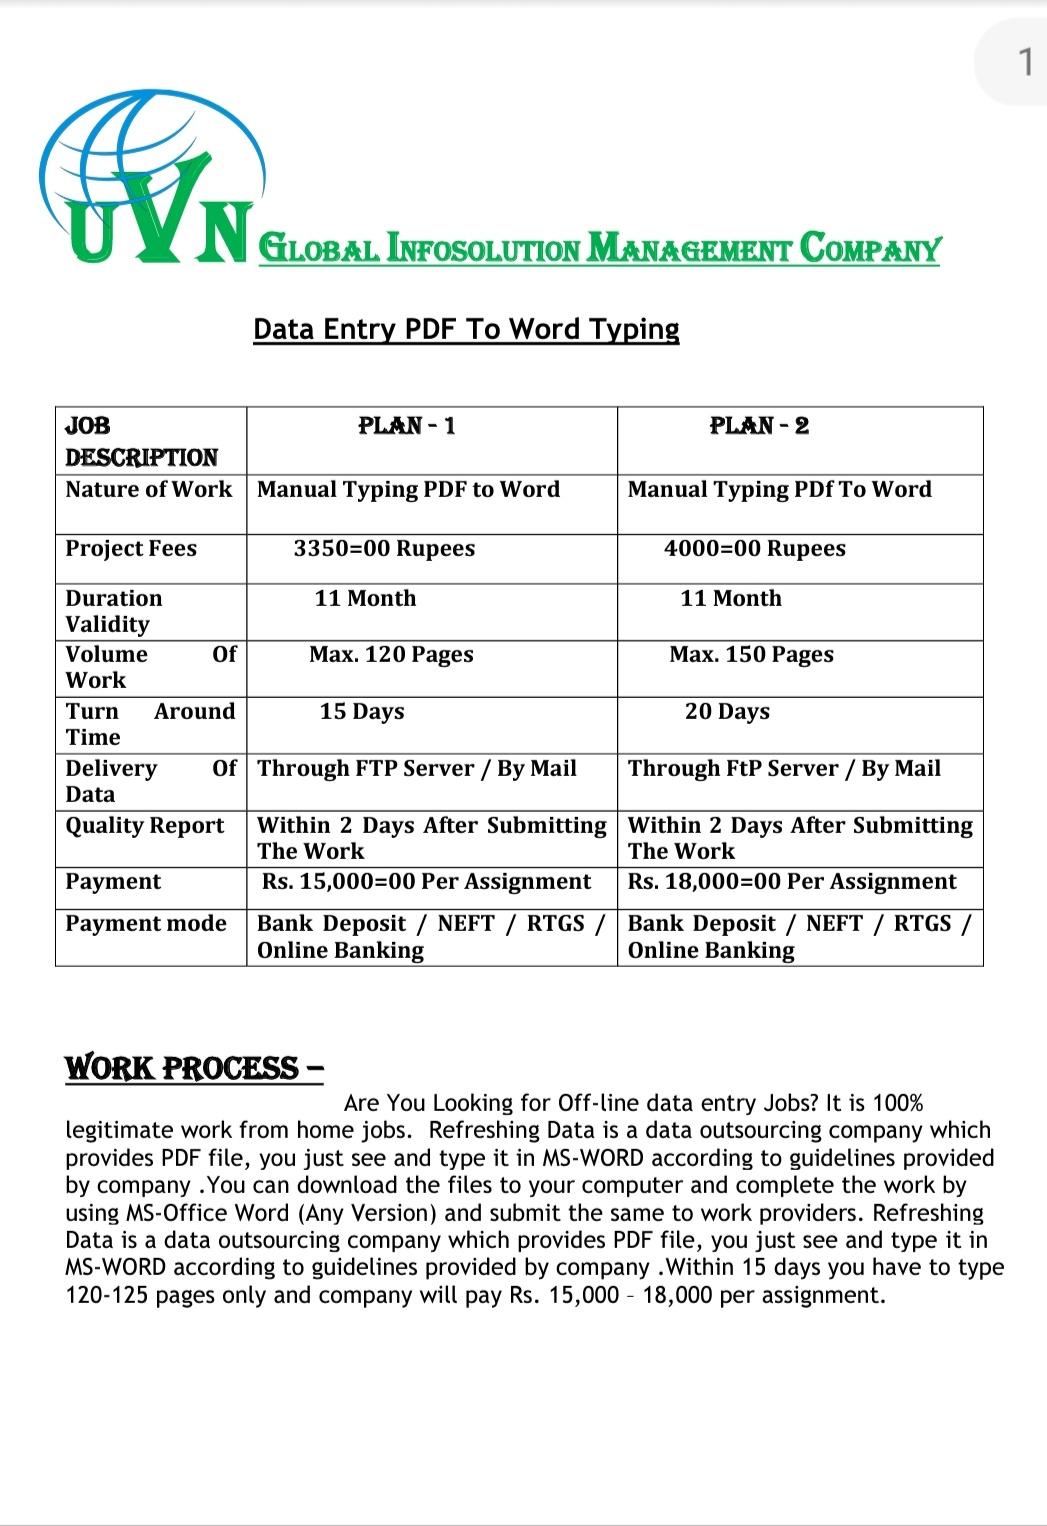 UVN Global Infosolution Management Co  in Dhanipur, Aligarh-202001